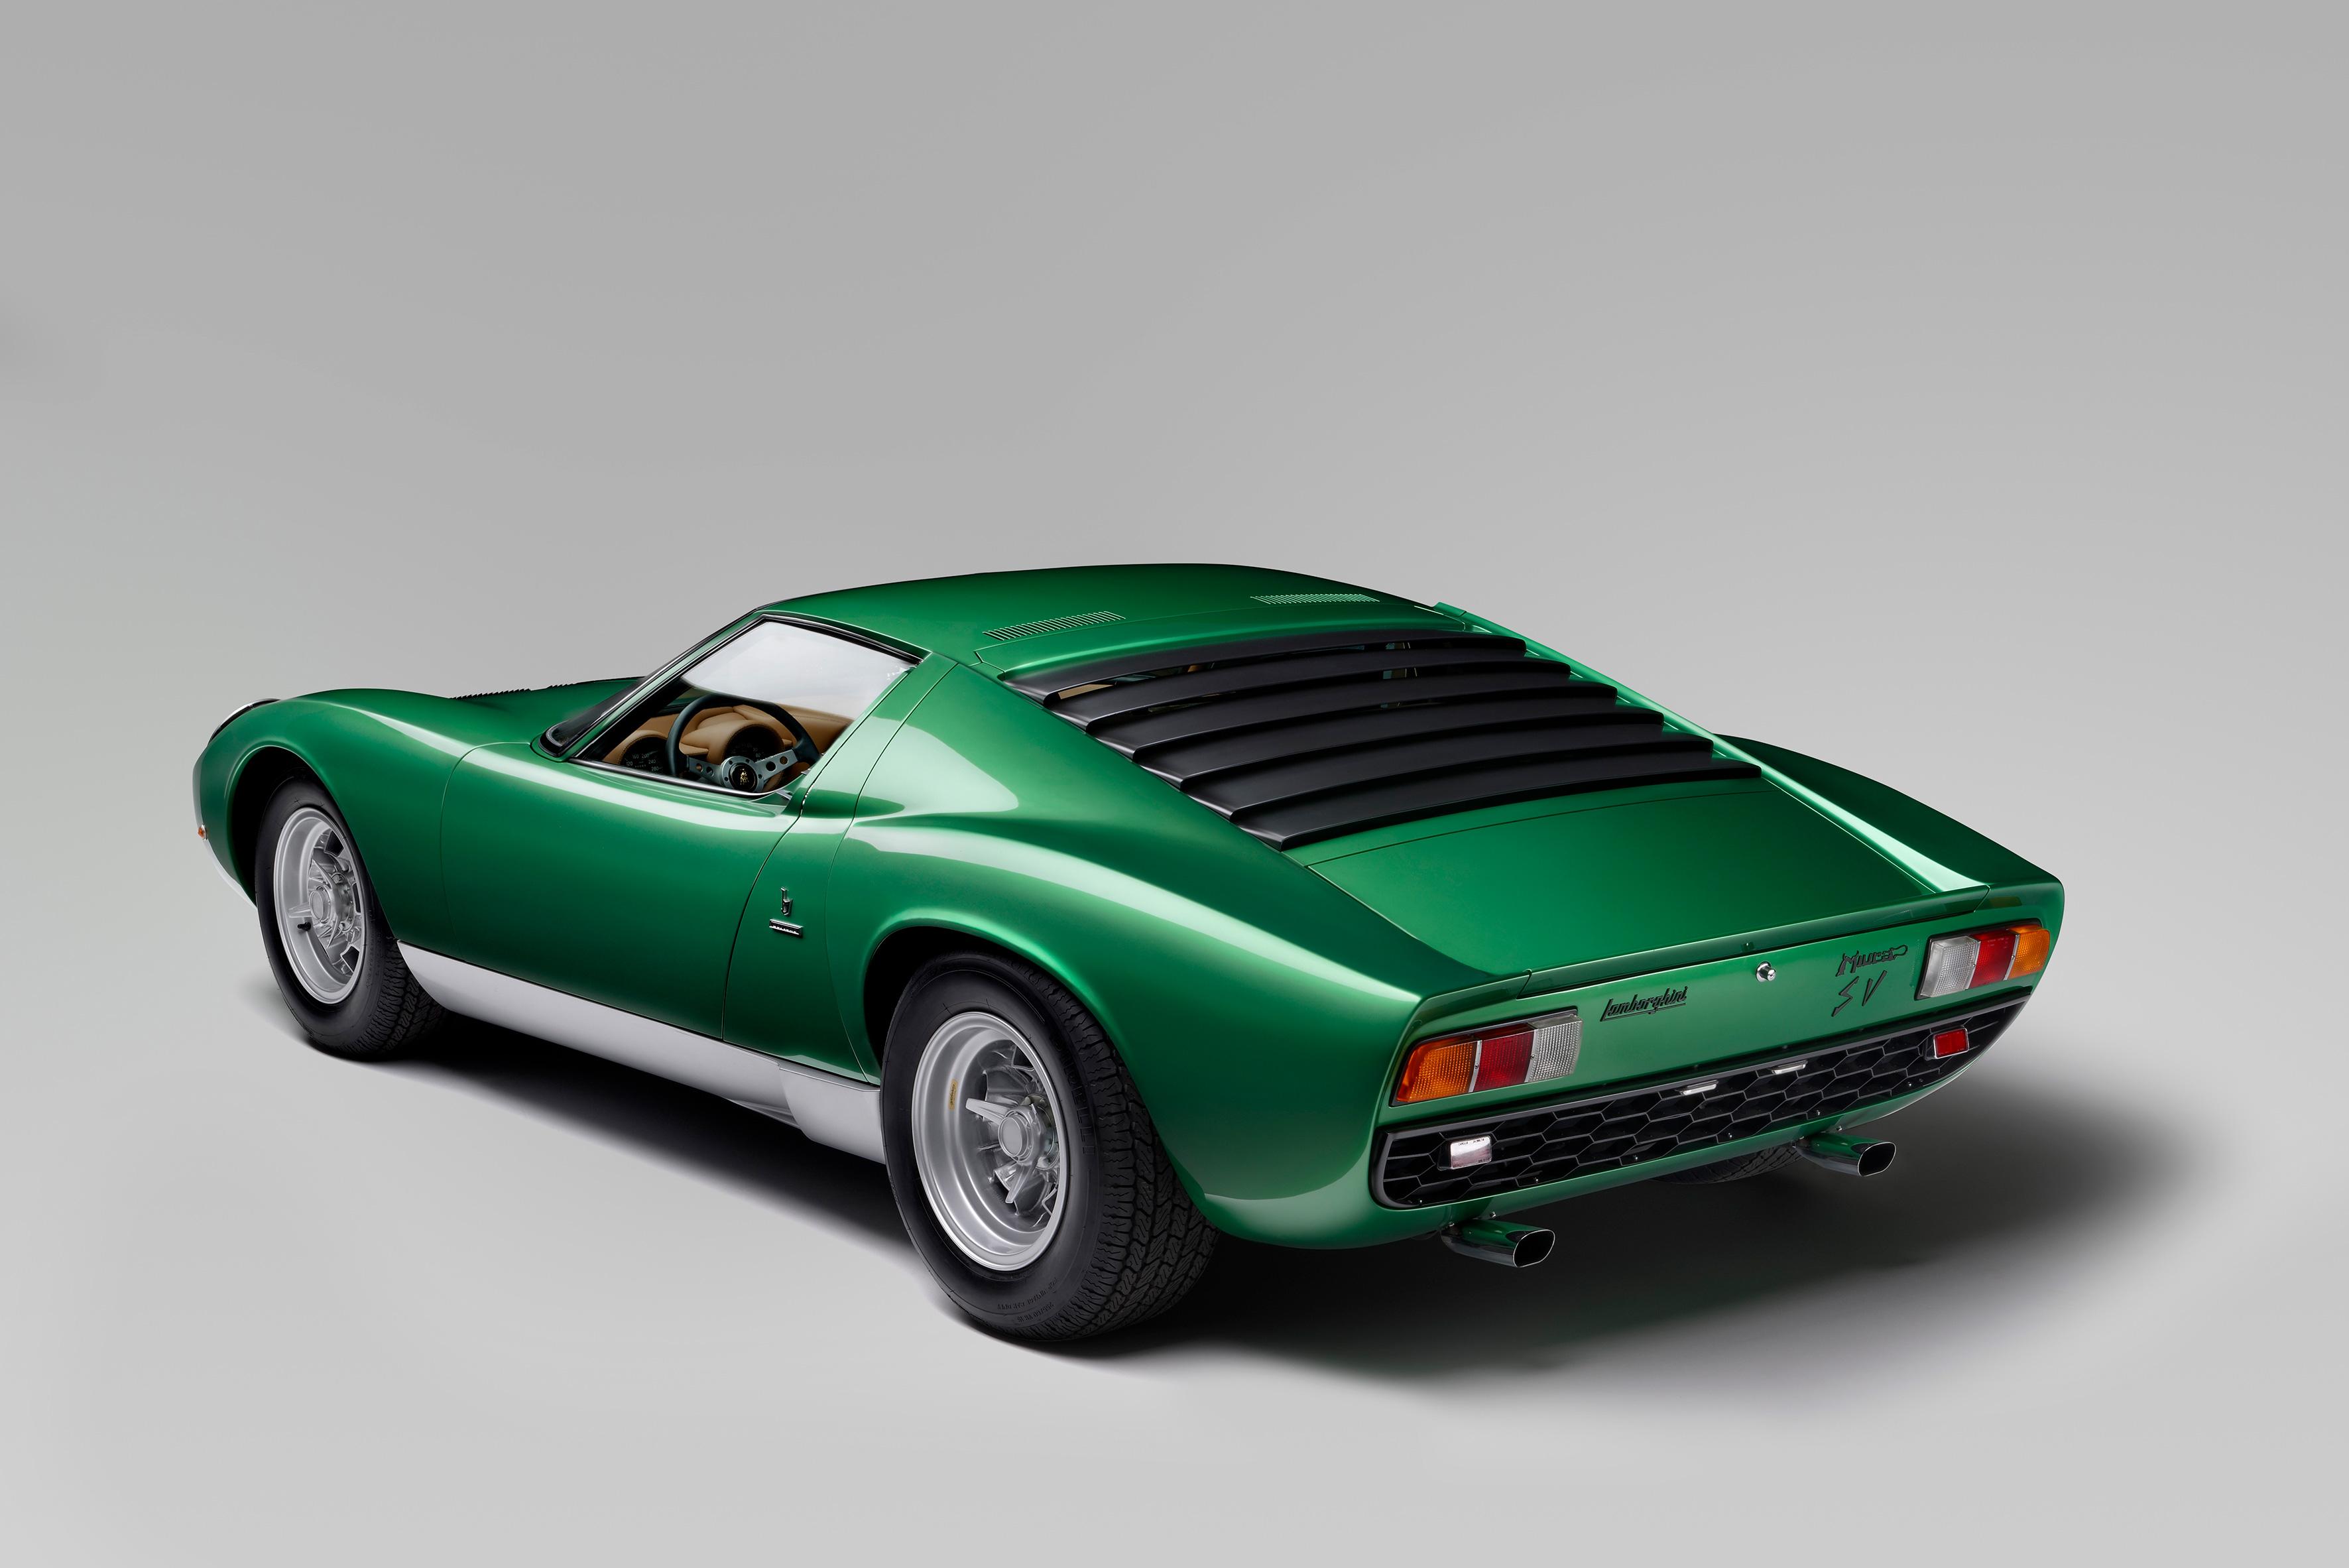 Lamborghini Miura P400 Sv 1971 Hd Cars 4k Wallpapers Images